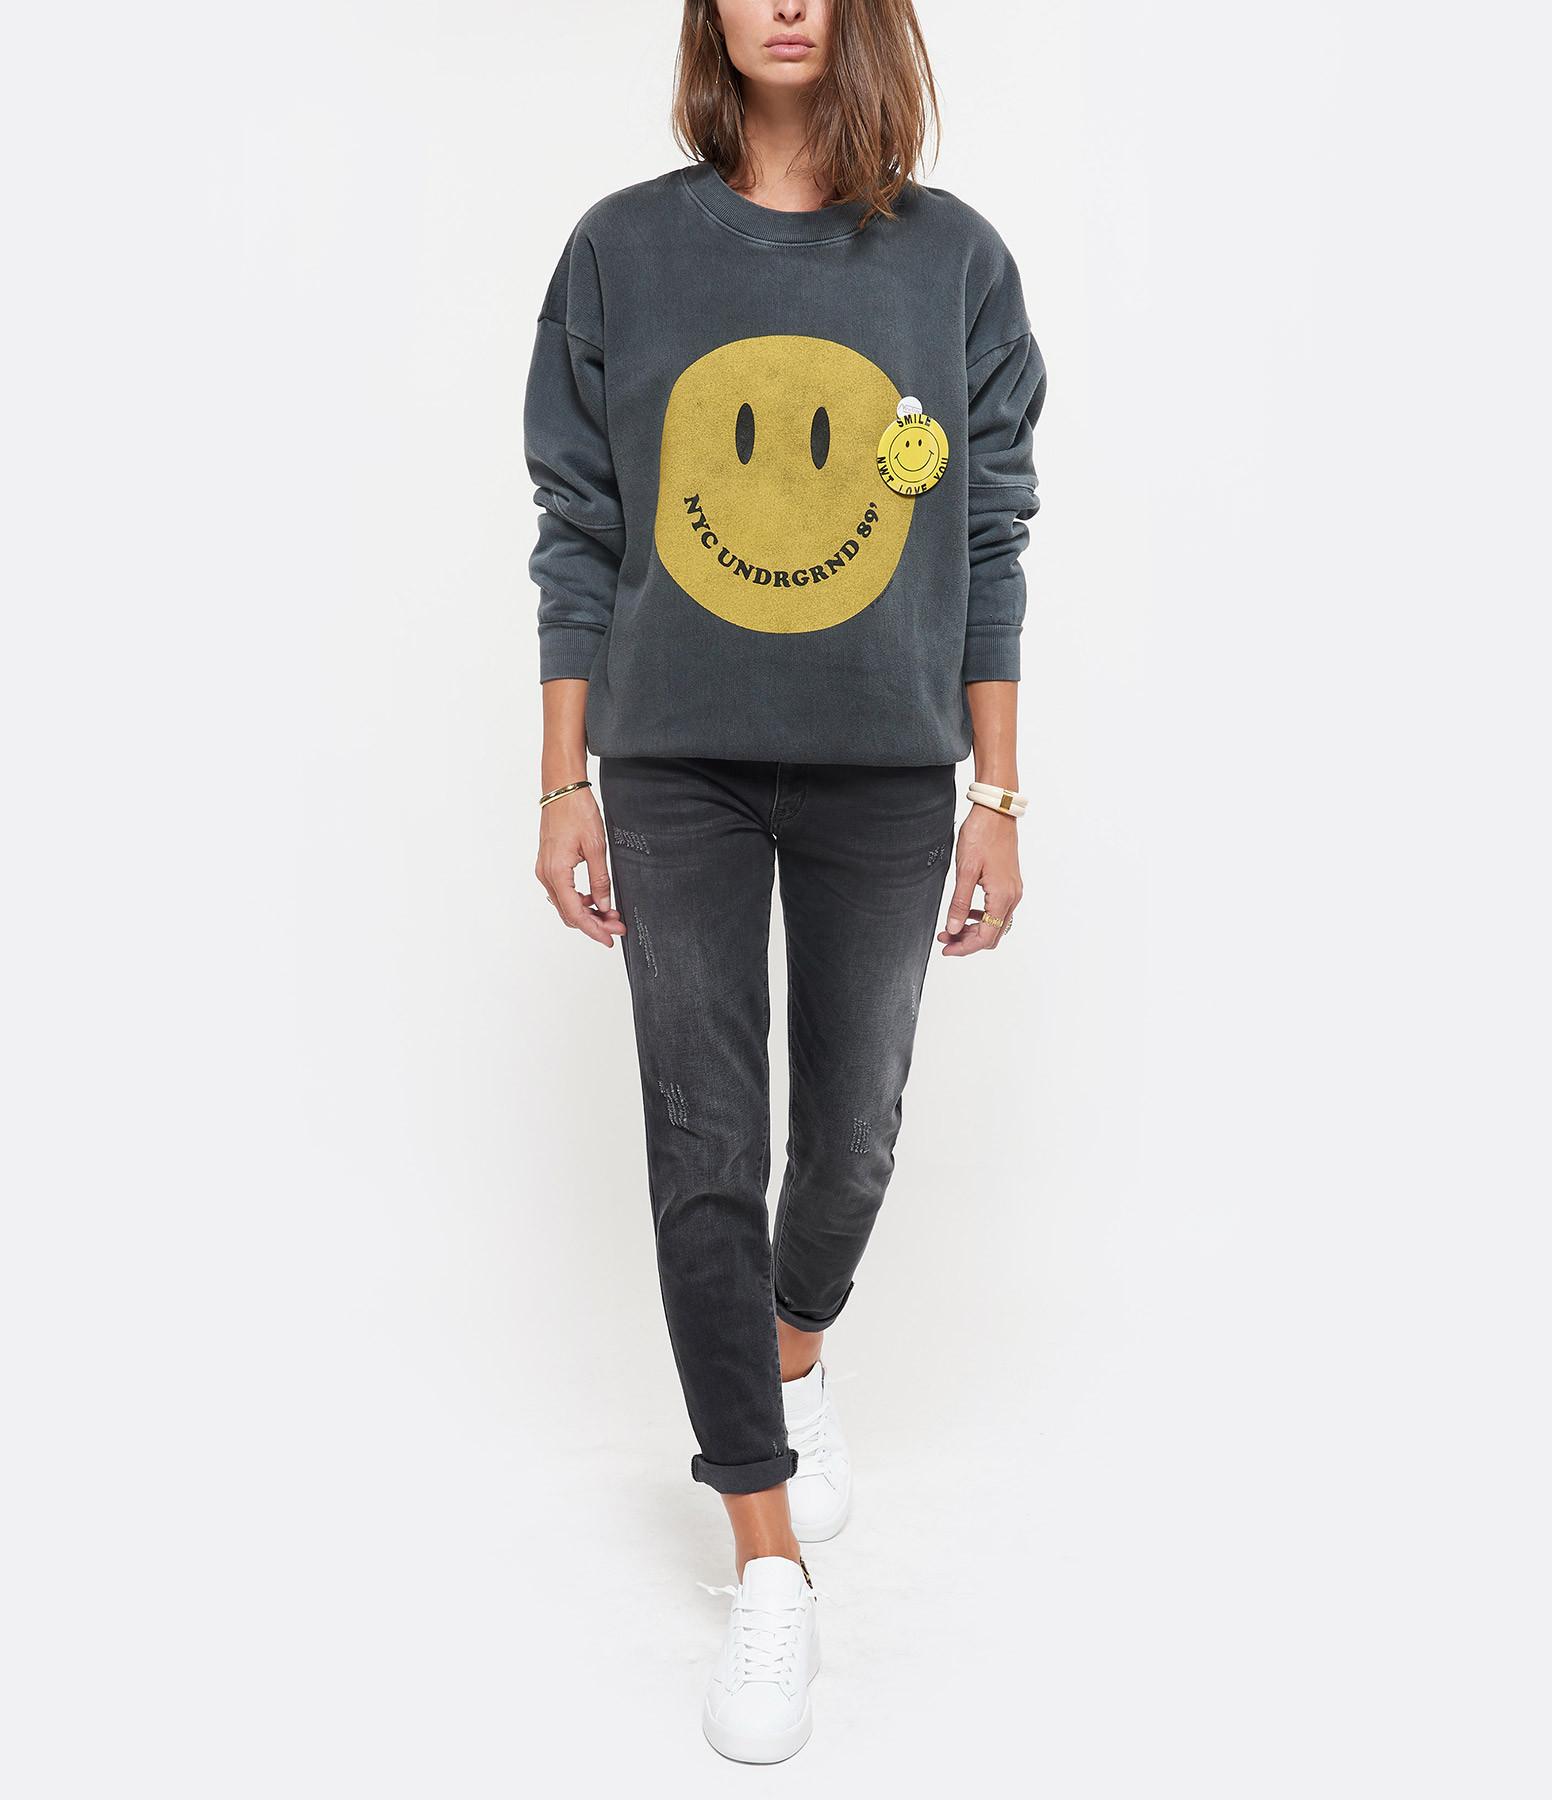 NEWTONE - Sweatshirt Roller Smiley Coton Pepper